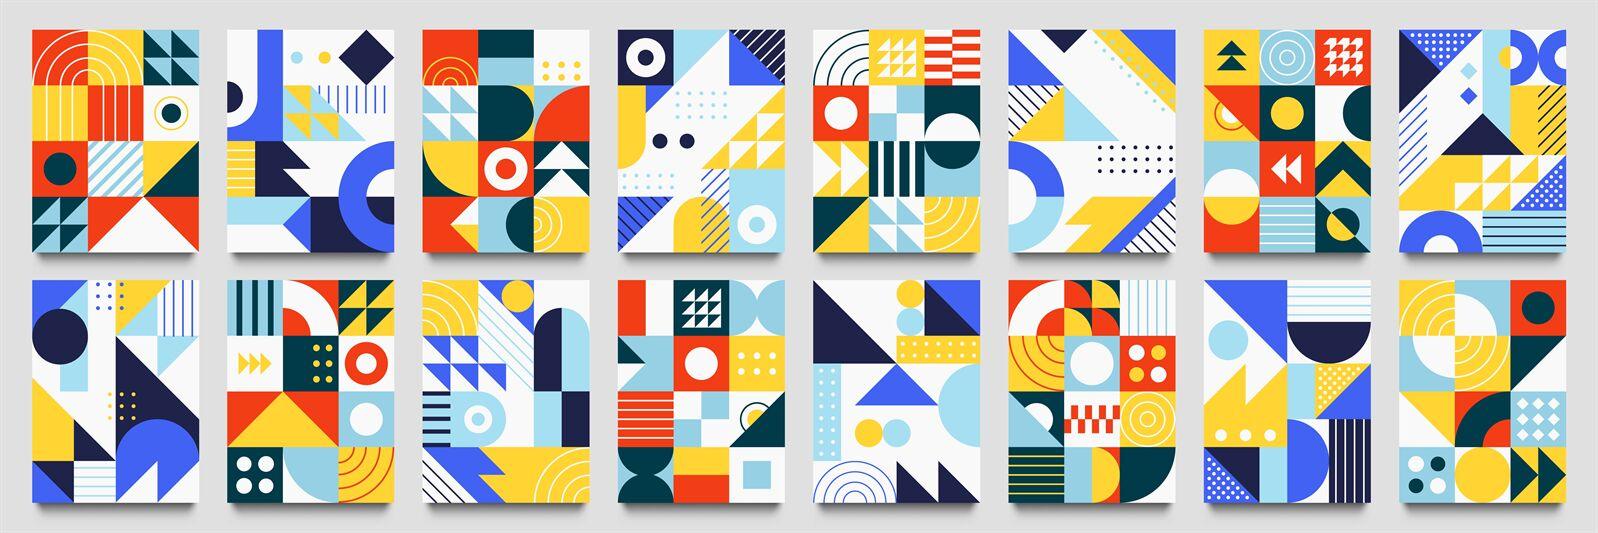 Abstract Geometric Backgrounds Neo Geo Pattern Minimalist Retro